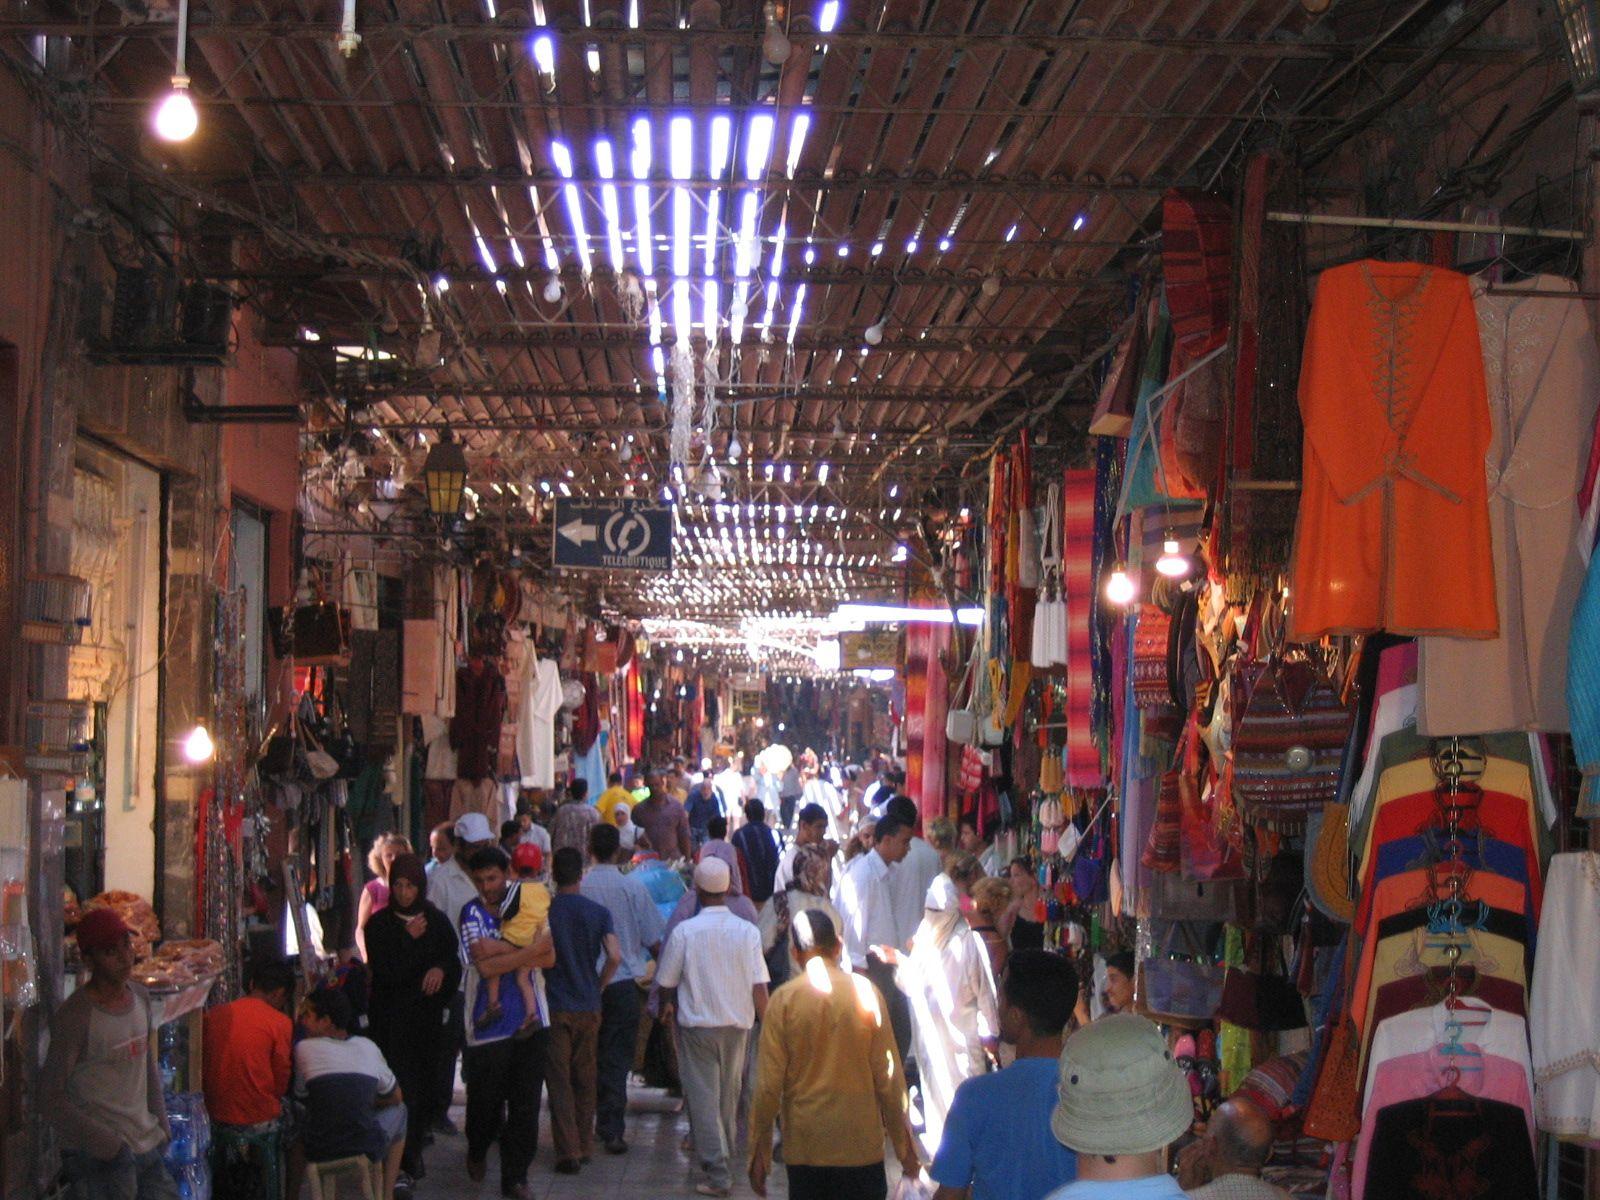 Old Souk (Byblos, Lebanon): Top Tips Before You Go - TripAdvisor